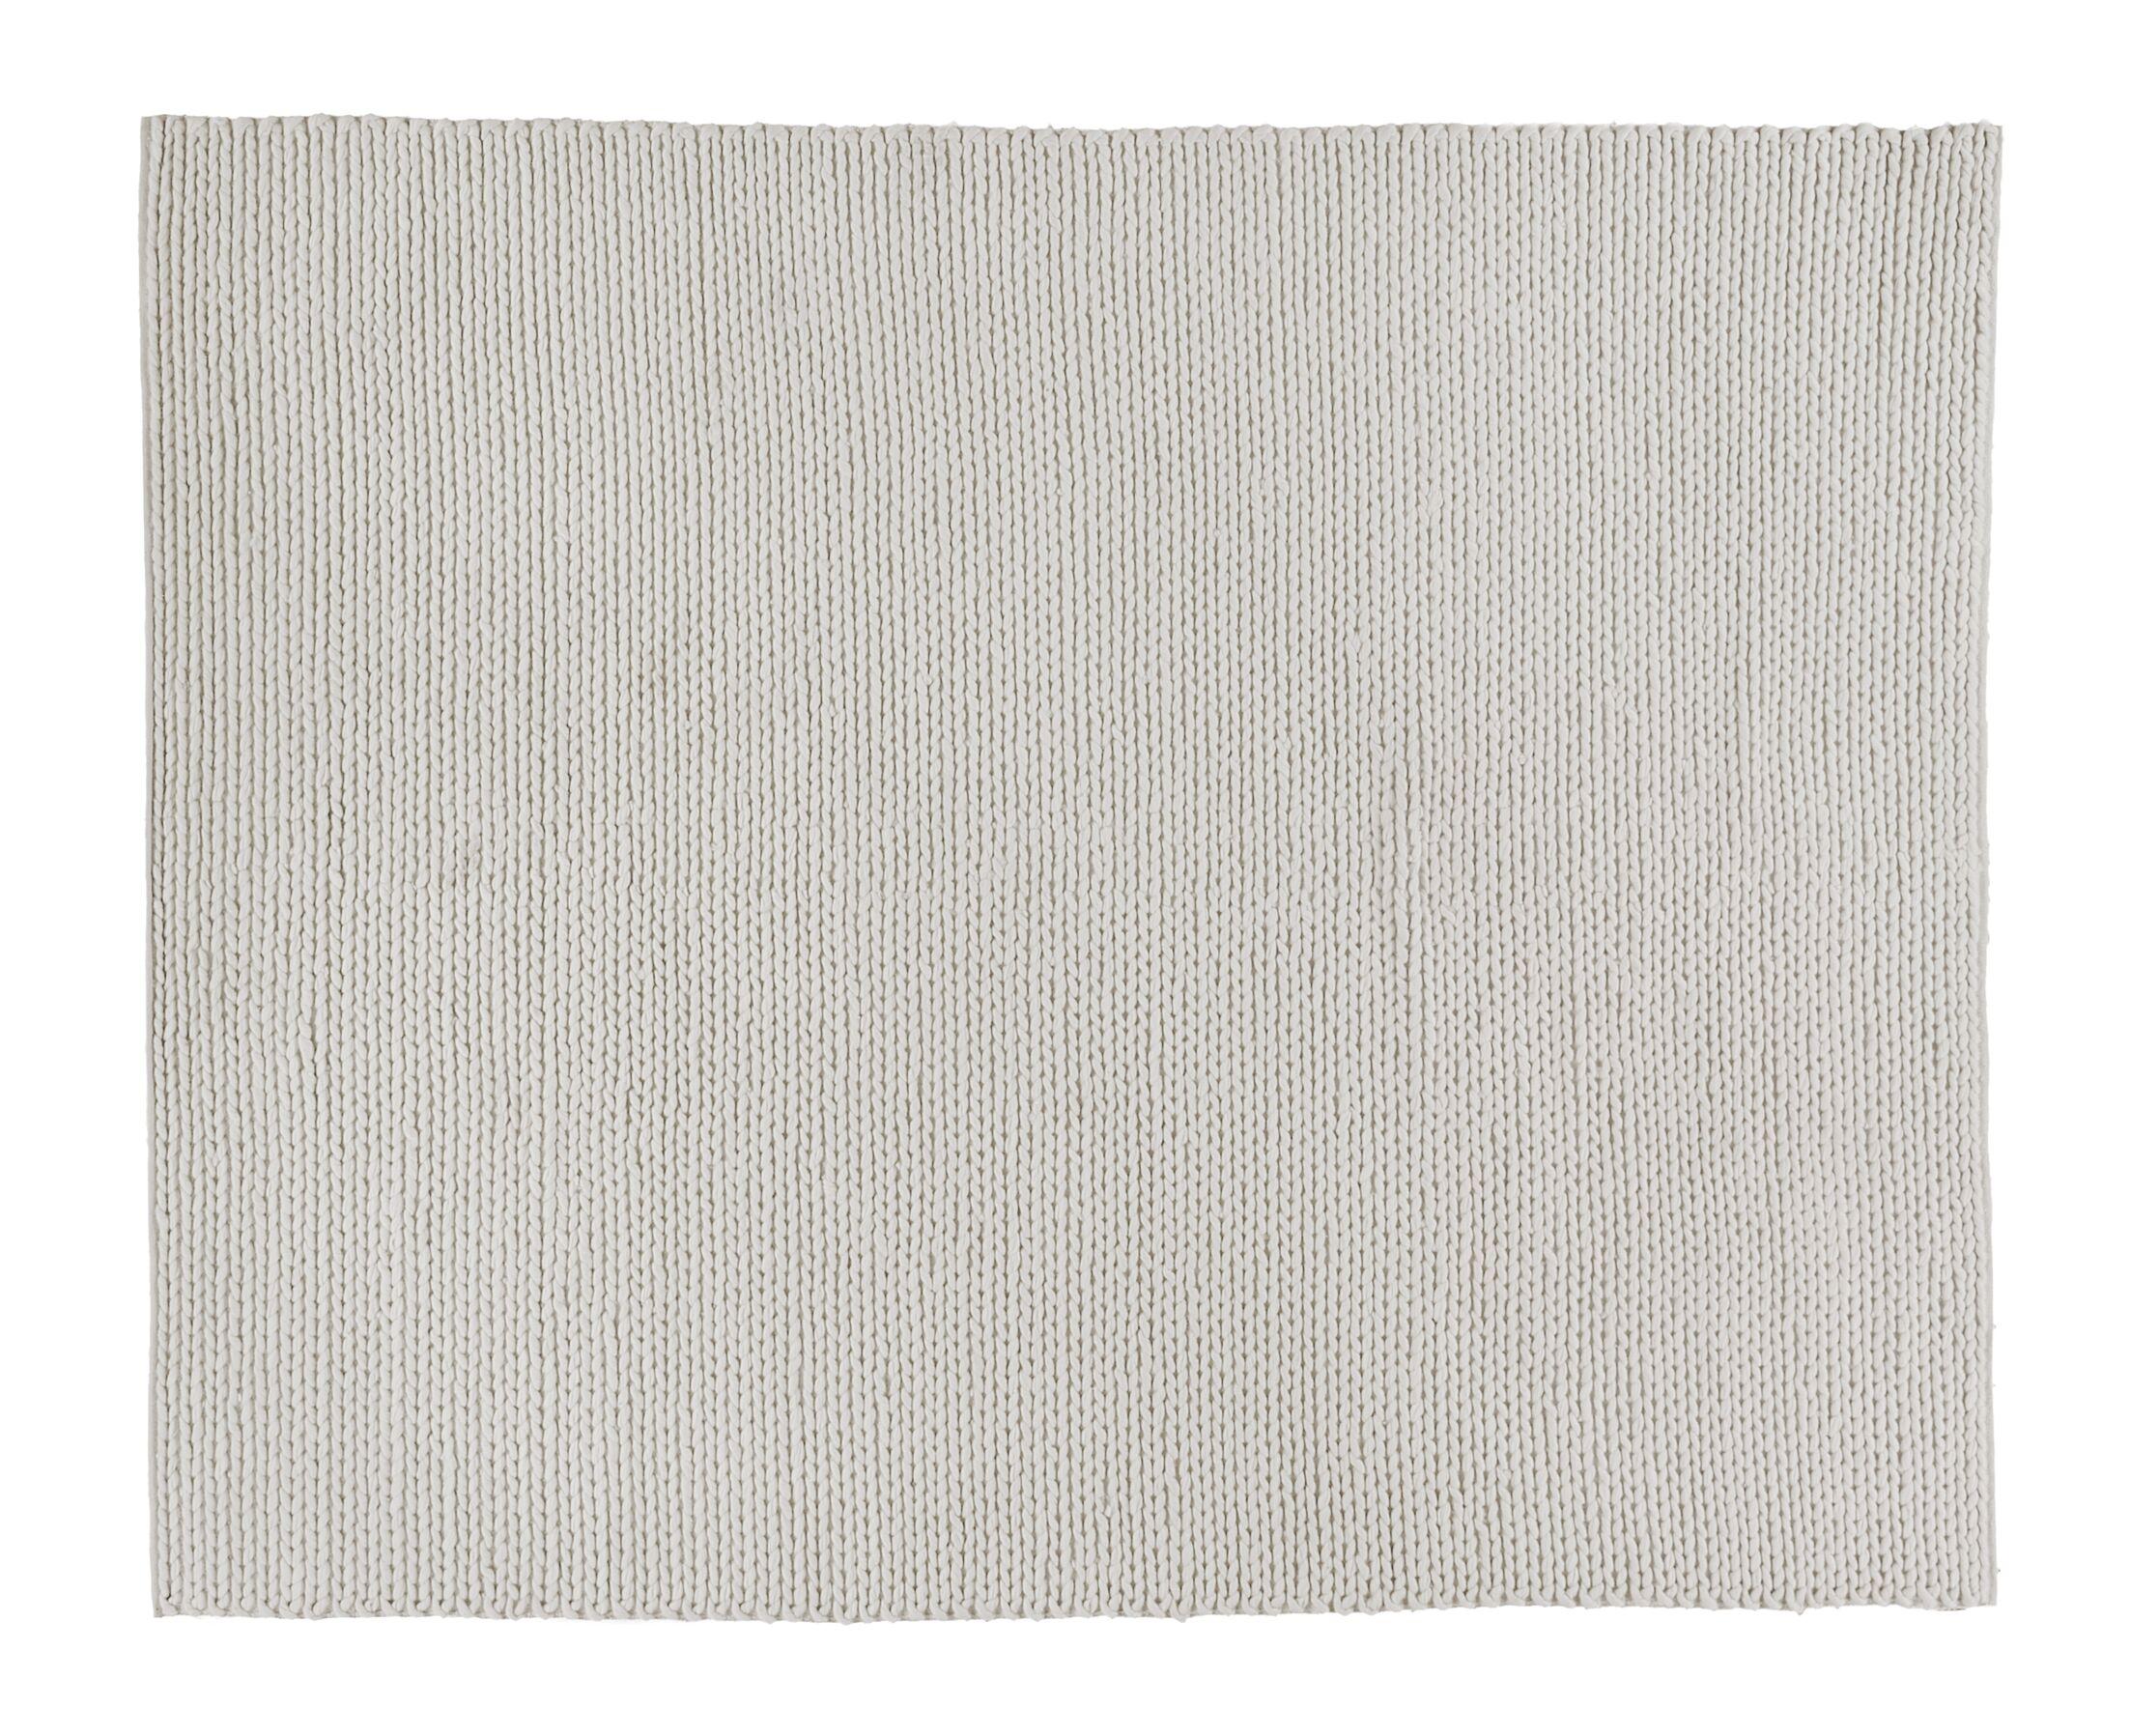 Arlow Hand-Woven Gray Area Rug Rug Size: Rectangle 10' x 14'